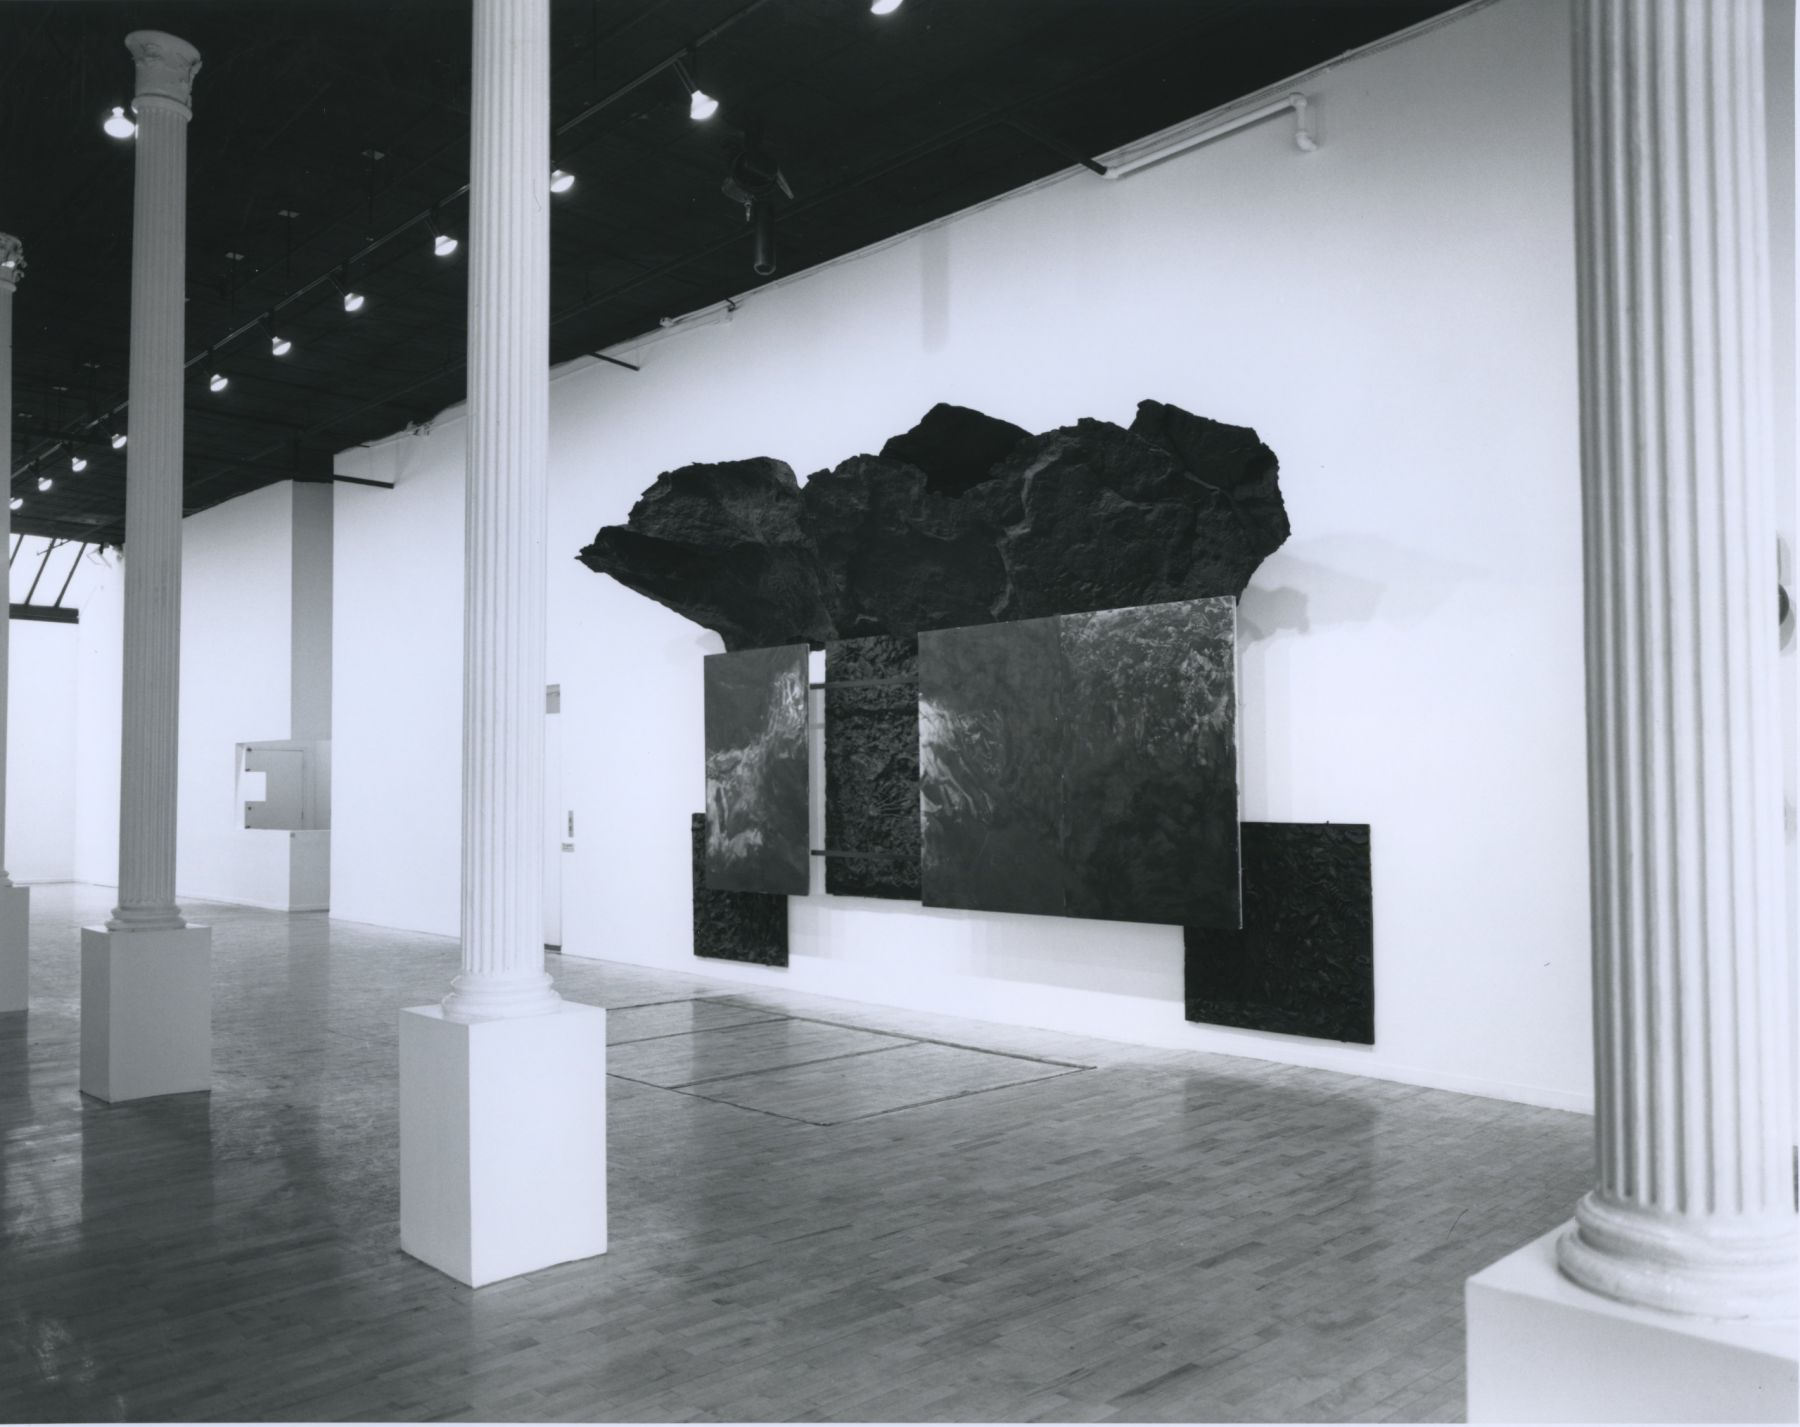 Installation view, Robert Morris, 142 GREENE